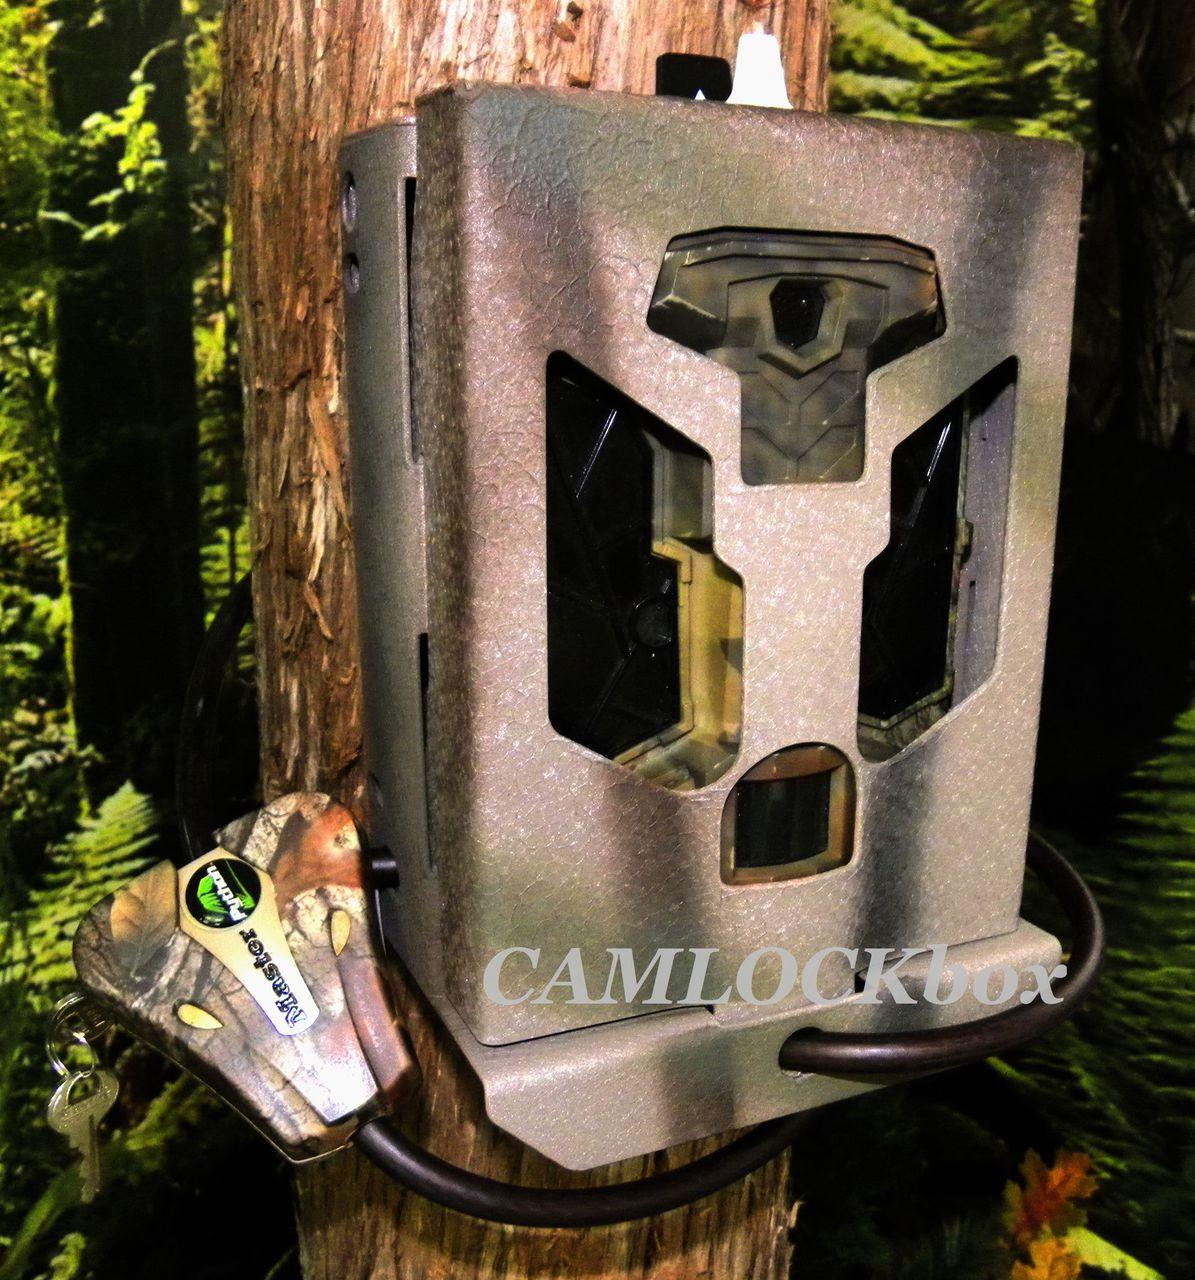 Spypoint Link 4gv Security Box Camlockbox